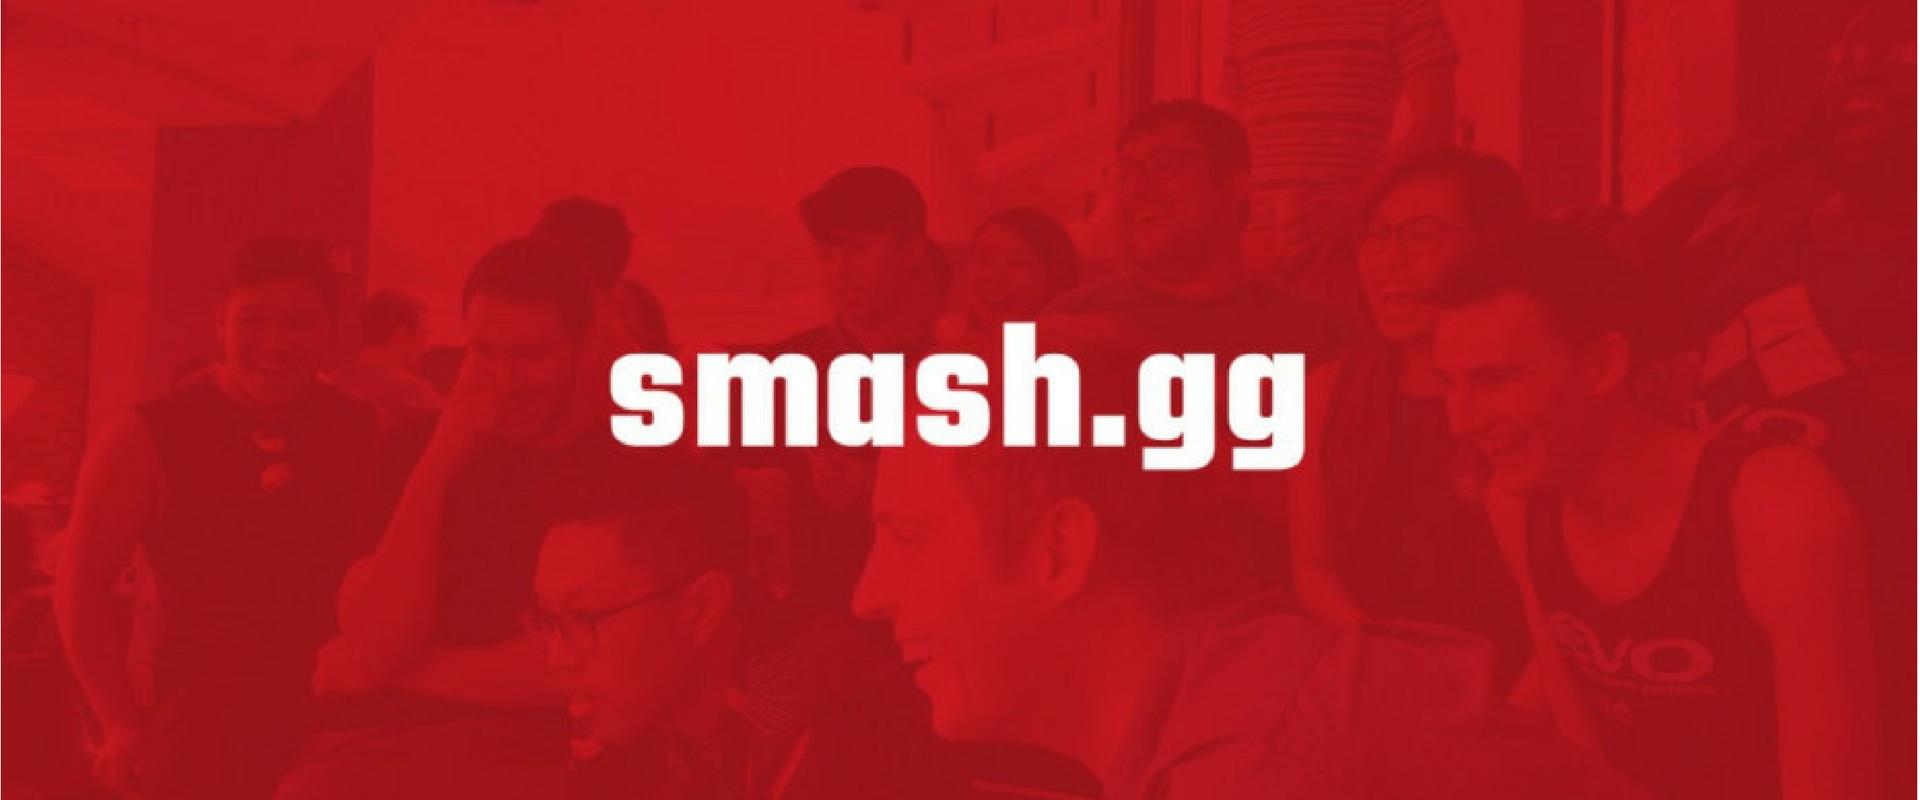 Smash.gg dostaje 11 mln